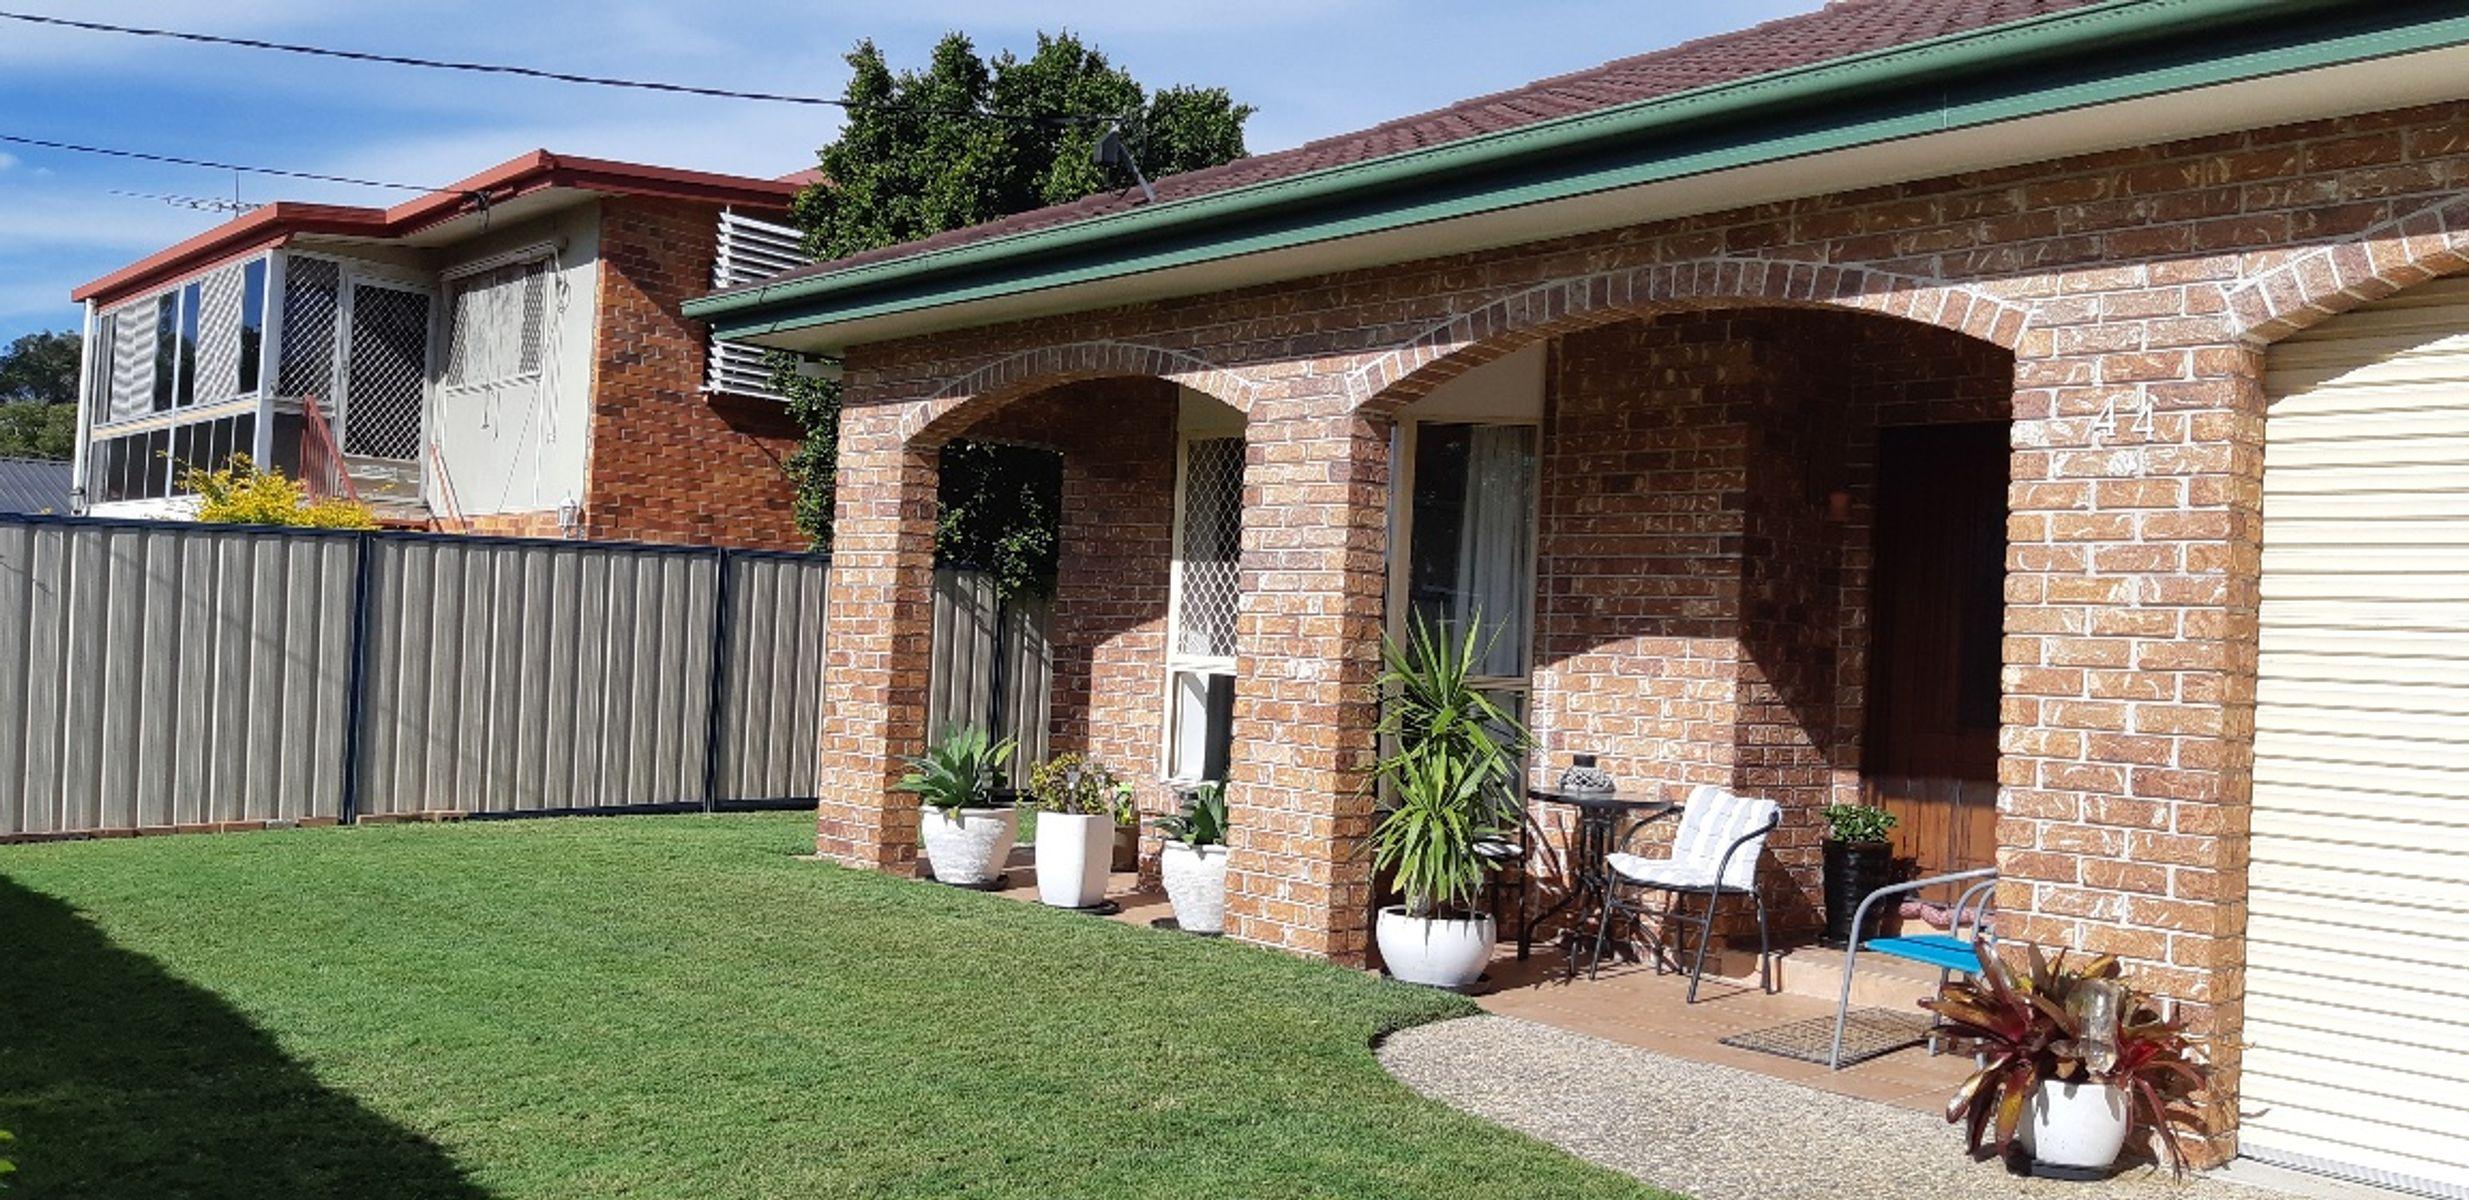 44 Kingfisher Drive, Bongaree, QLD 4507